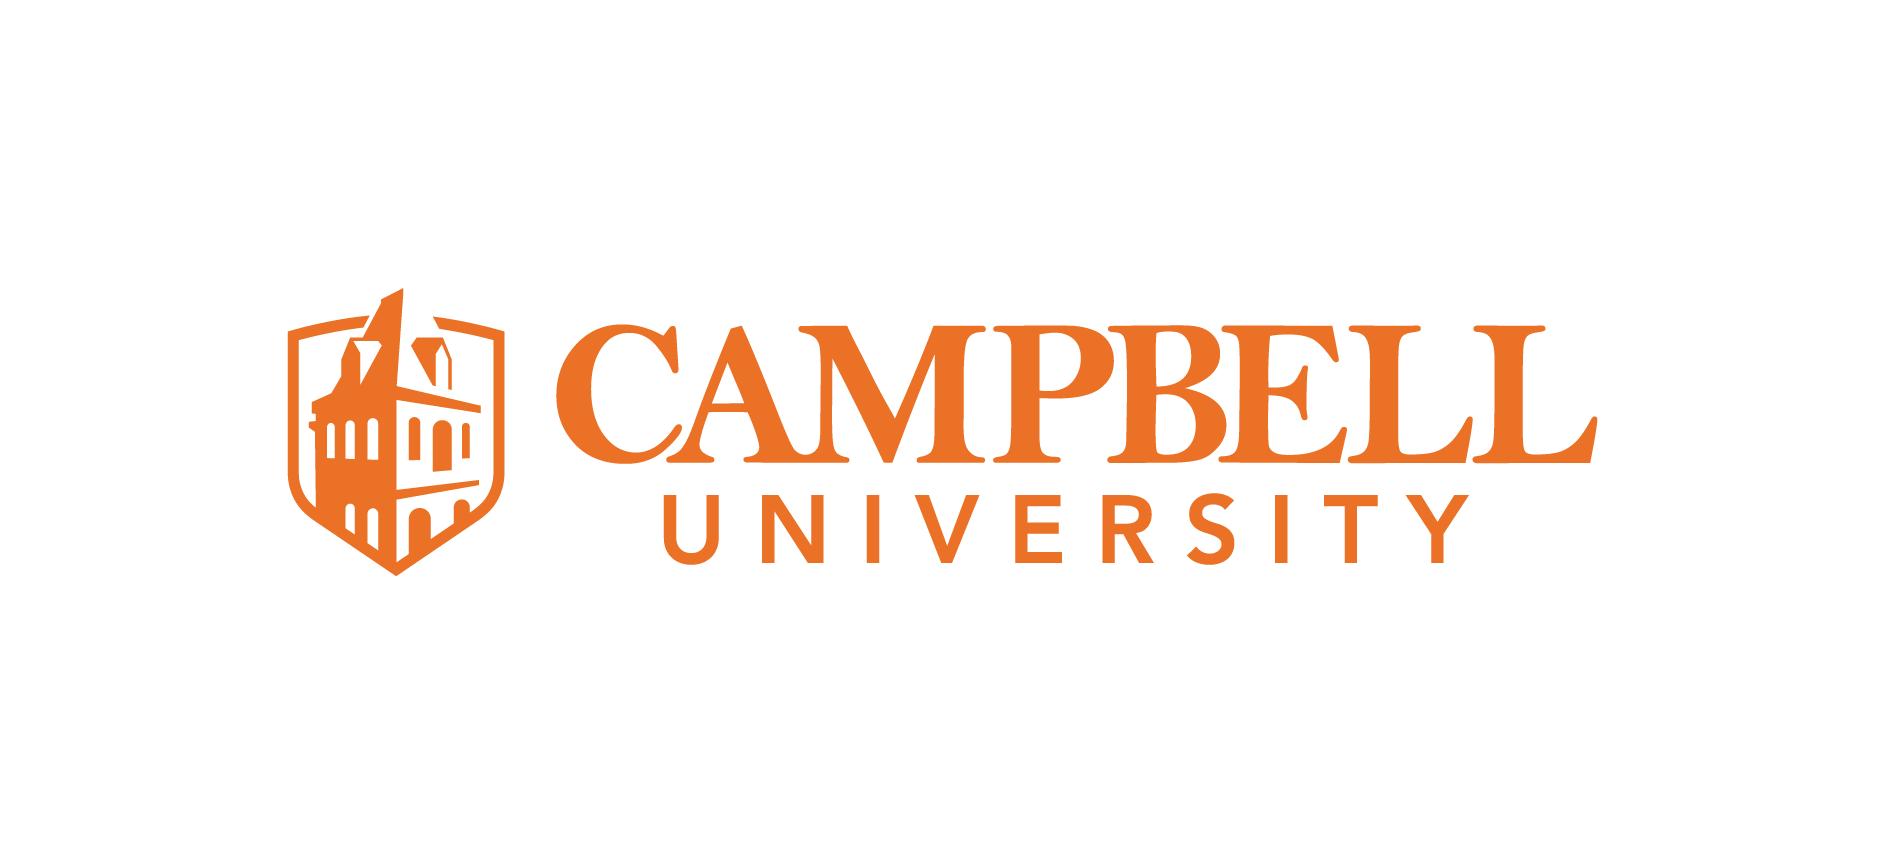 Campbell university logo horizontal align   screen   2017